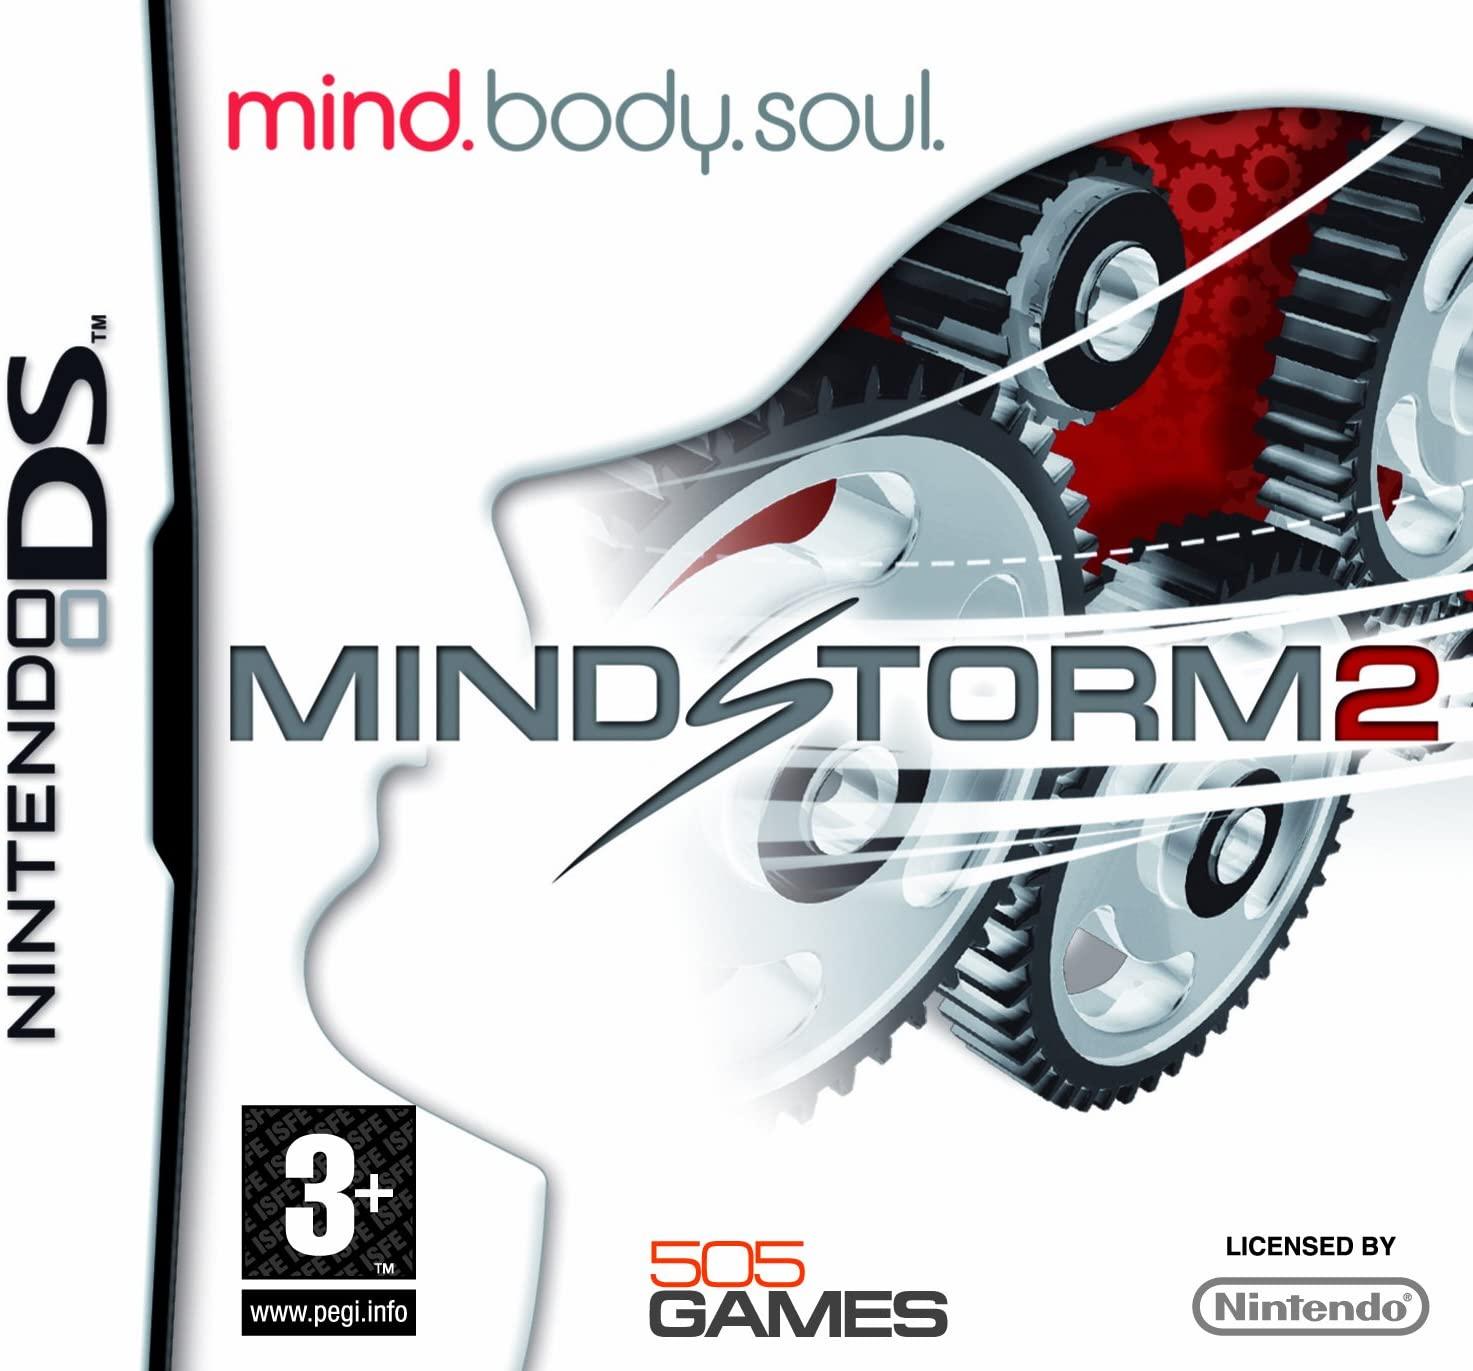 MinDStorm 2